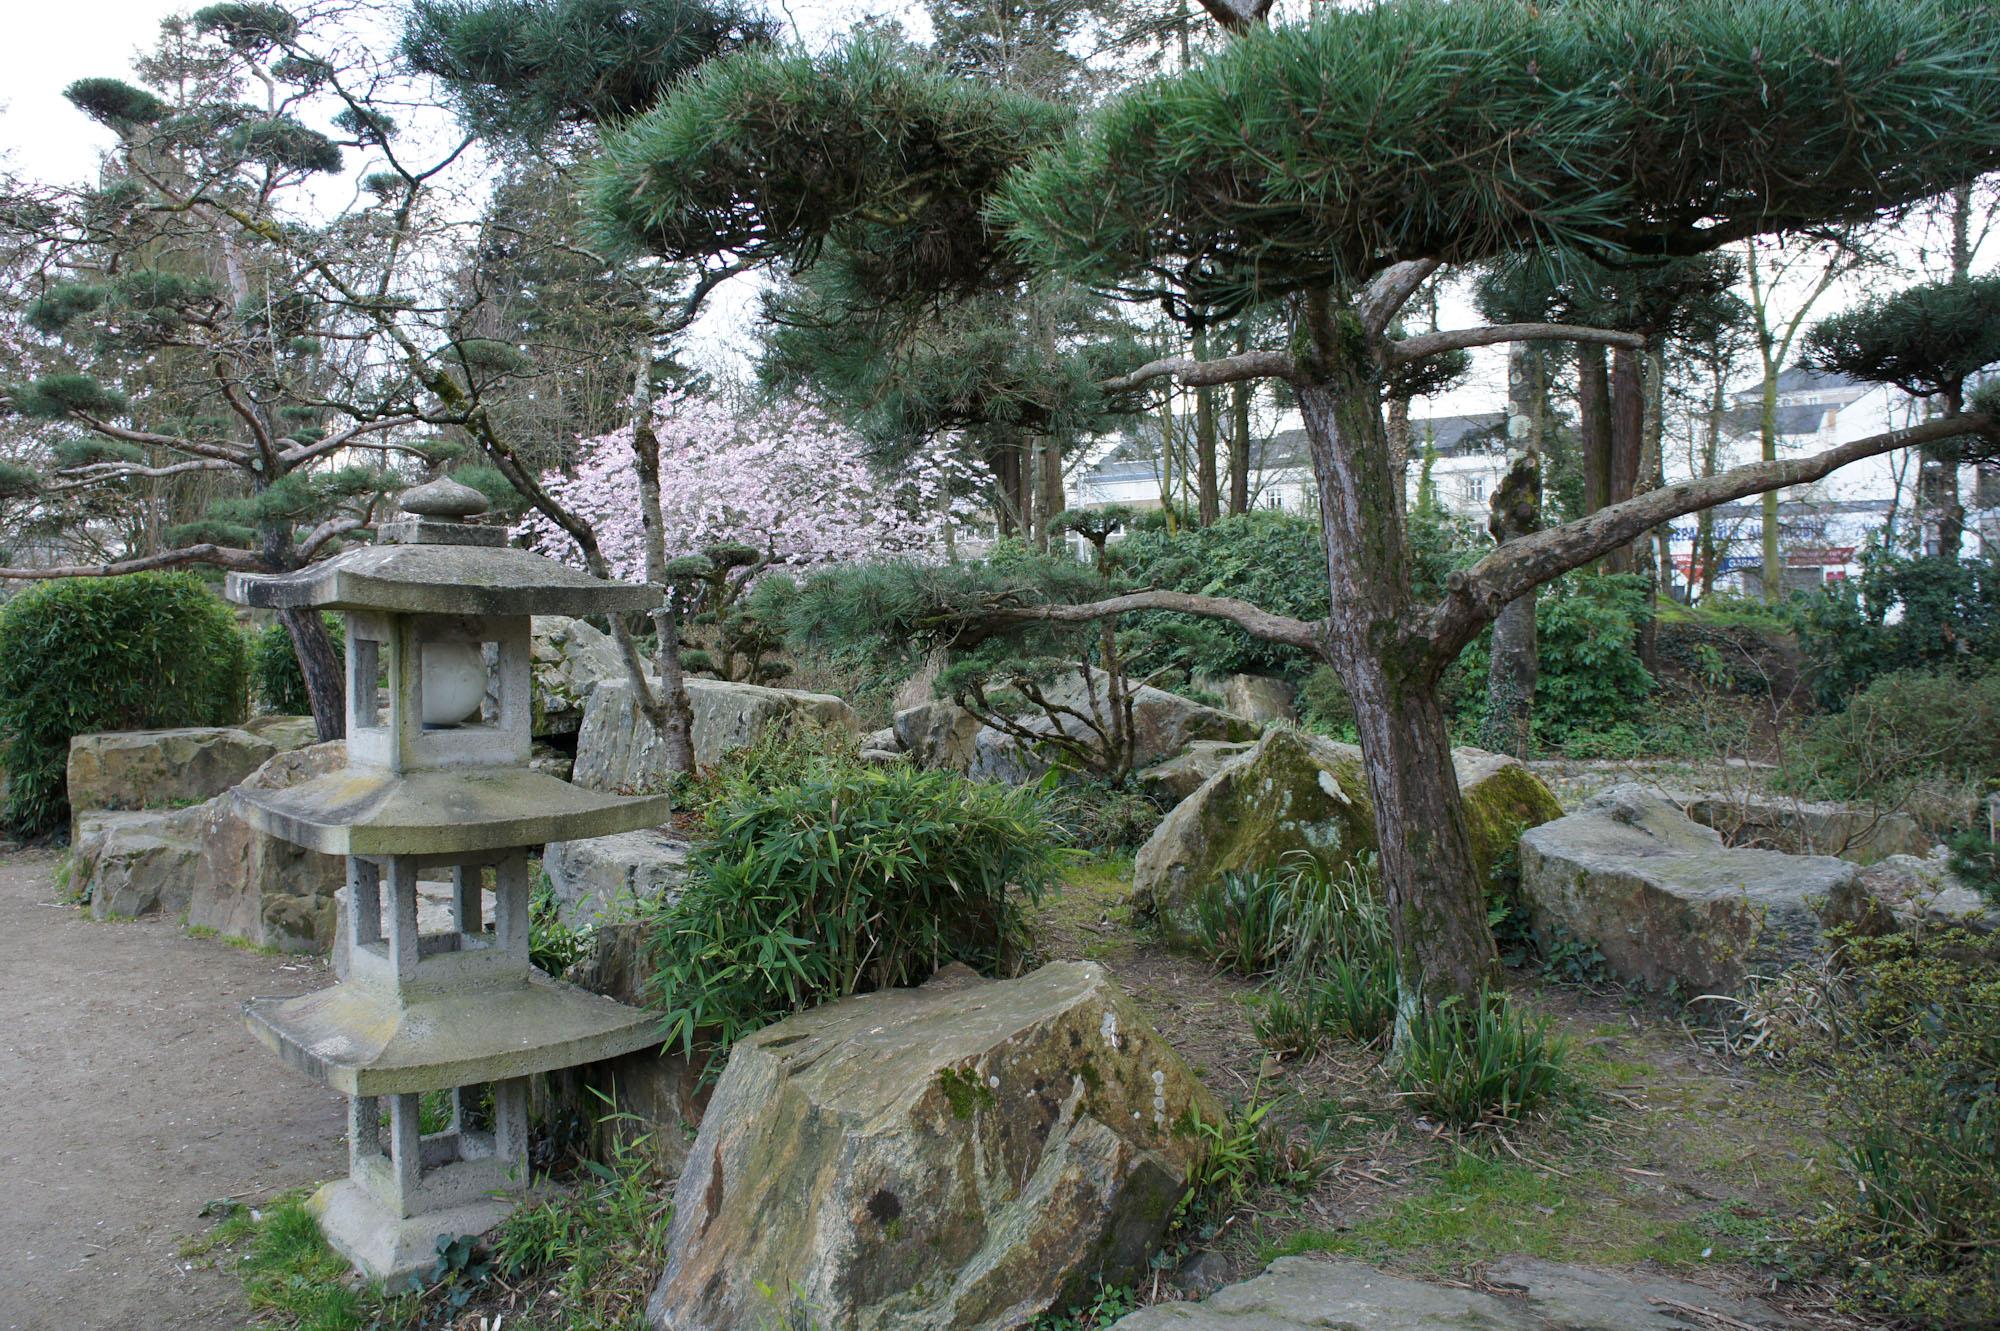 jardin japonais nantes. Black Bedroom Furniture Sets. Home Design Ideas